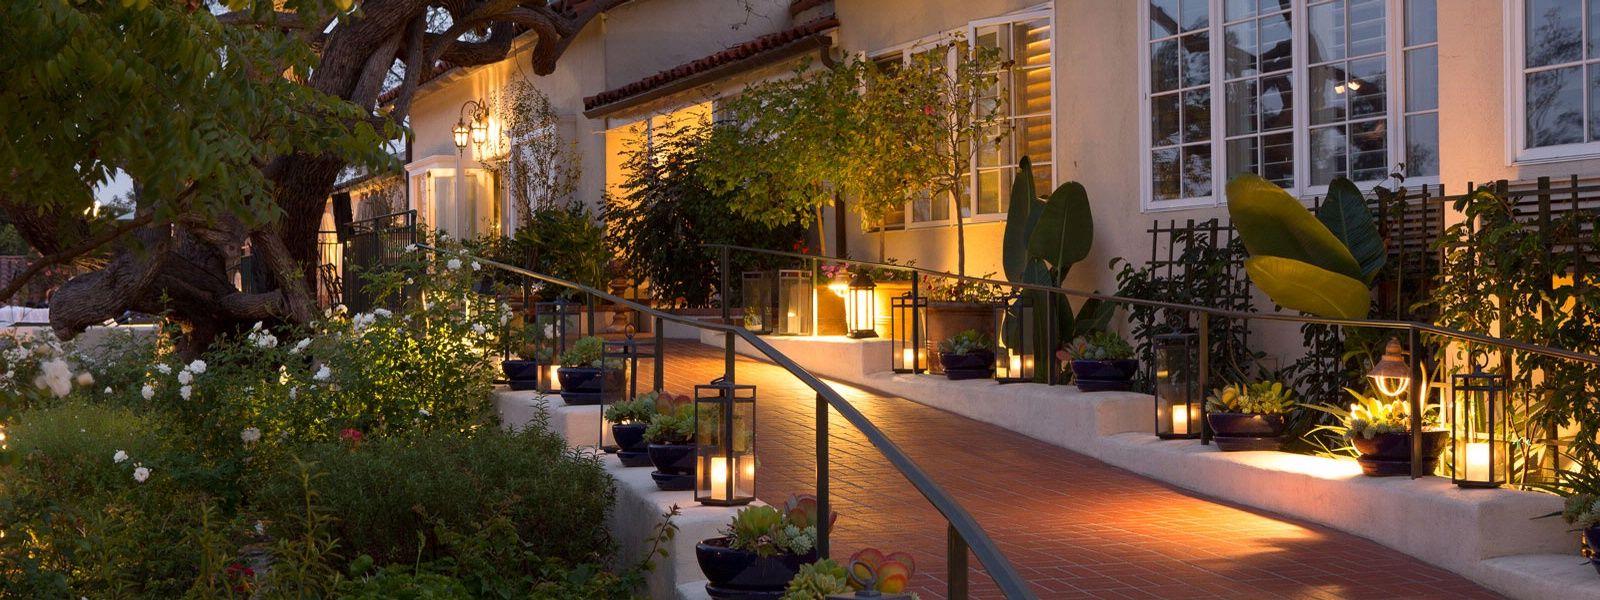 San Diego Luxury Hotels The Inn At Rancho Santa Fe Ca With